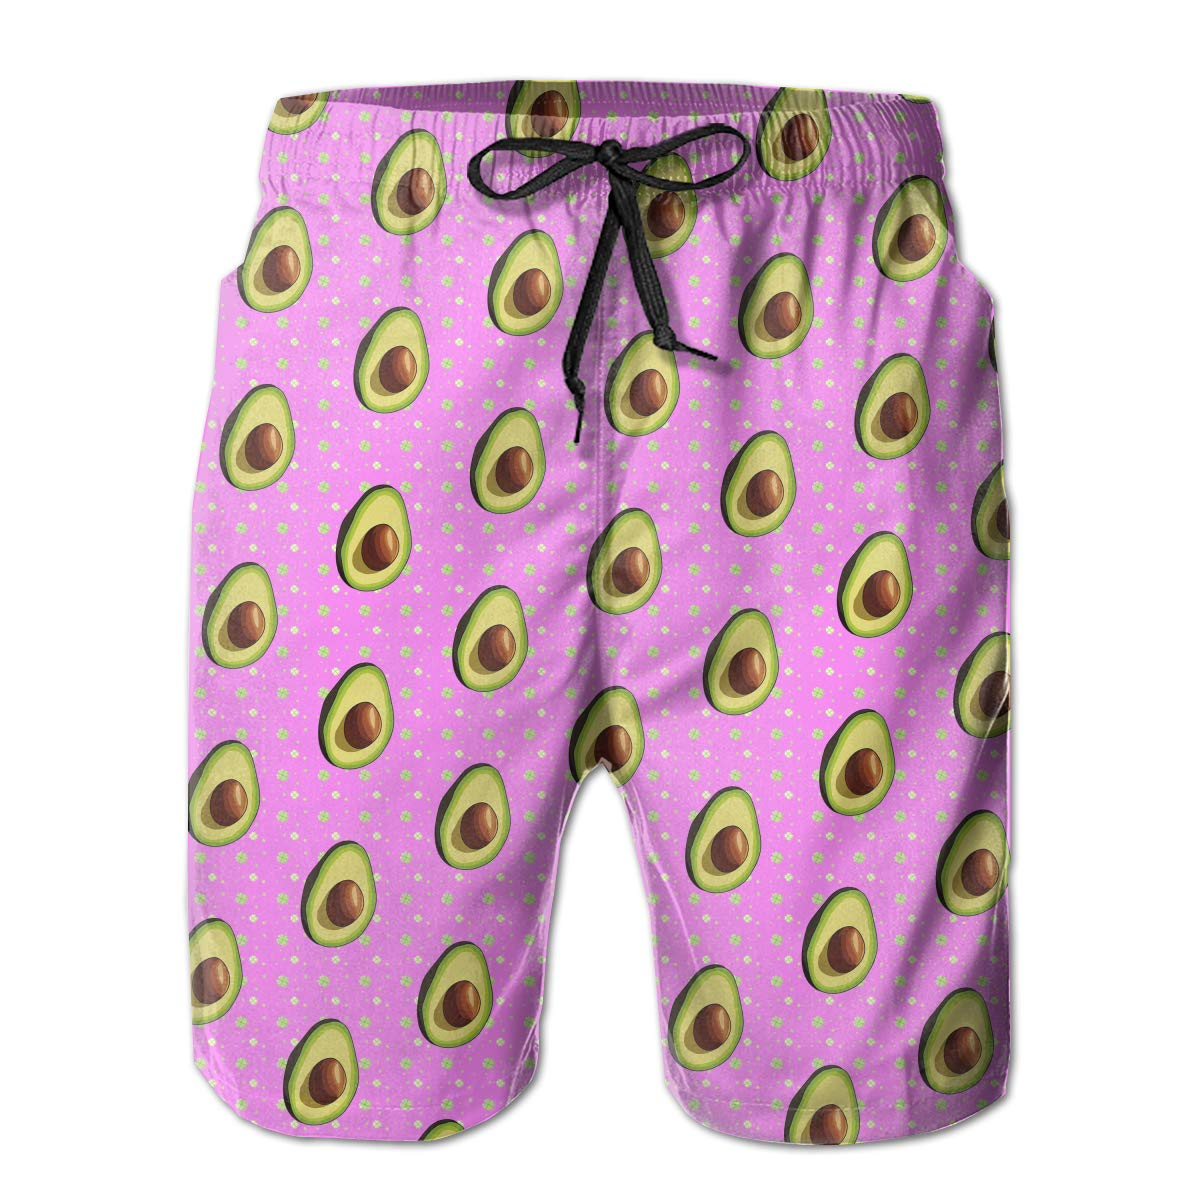 MikonsuAvocado Pattern Pink Mens Beachwear Surfing Boardshorts with Pocket